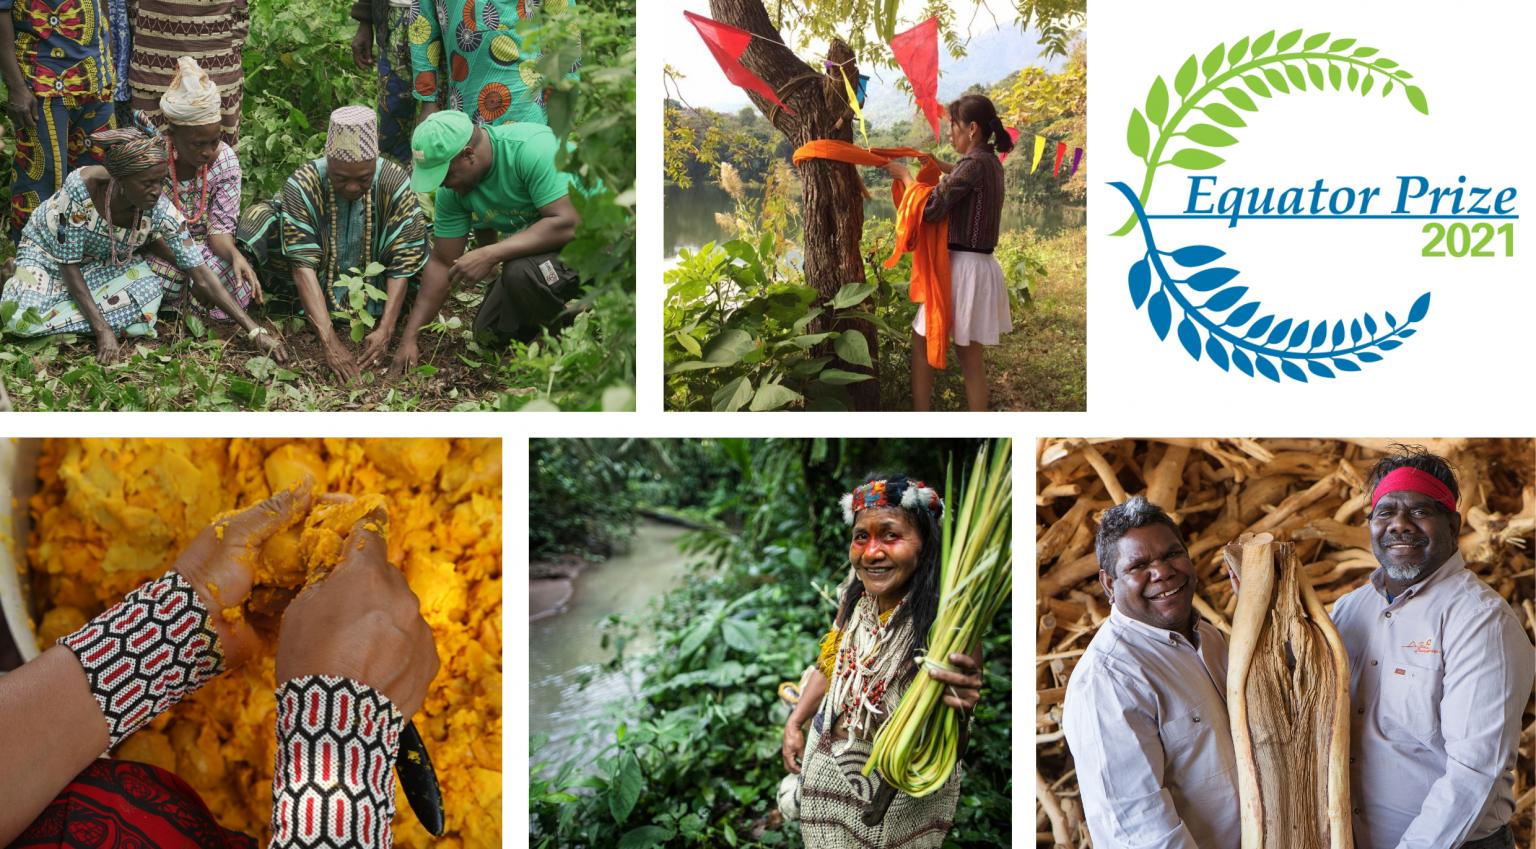 2-Indian organisations win UNDP Equator Prize 2021| 2-ഇന്ത്യൻ സംഘടനകൾ UNDP ഇക്വേറ്റർ സമ്മാനം 2021 നേടി_40.1